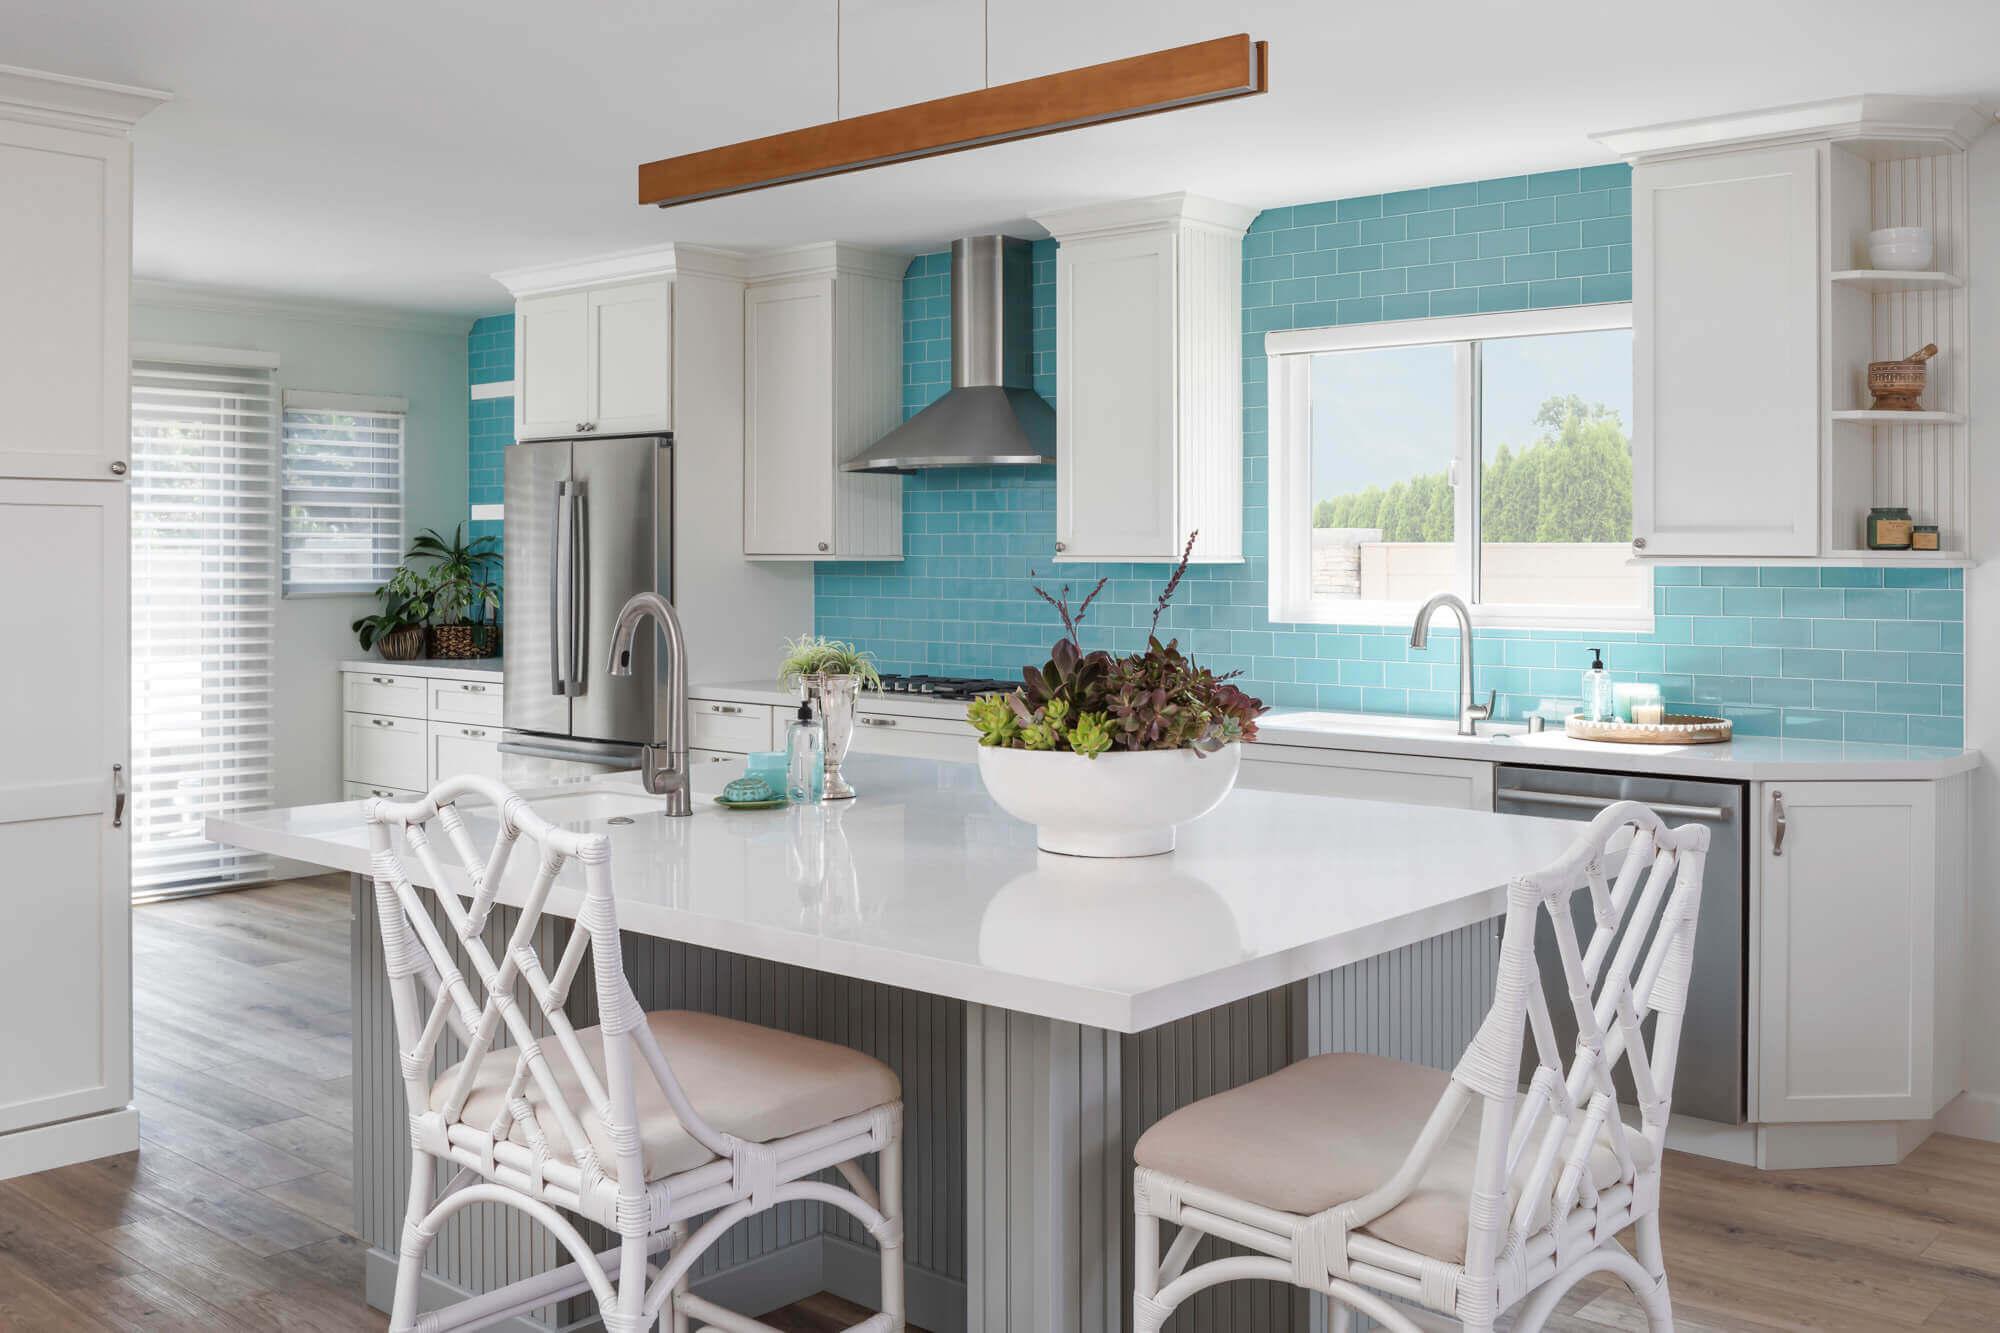 Kitchen-addition-by-design/build-firm